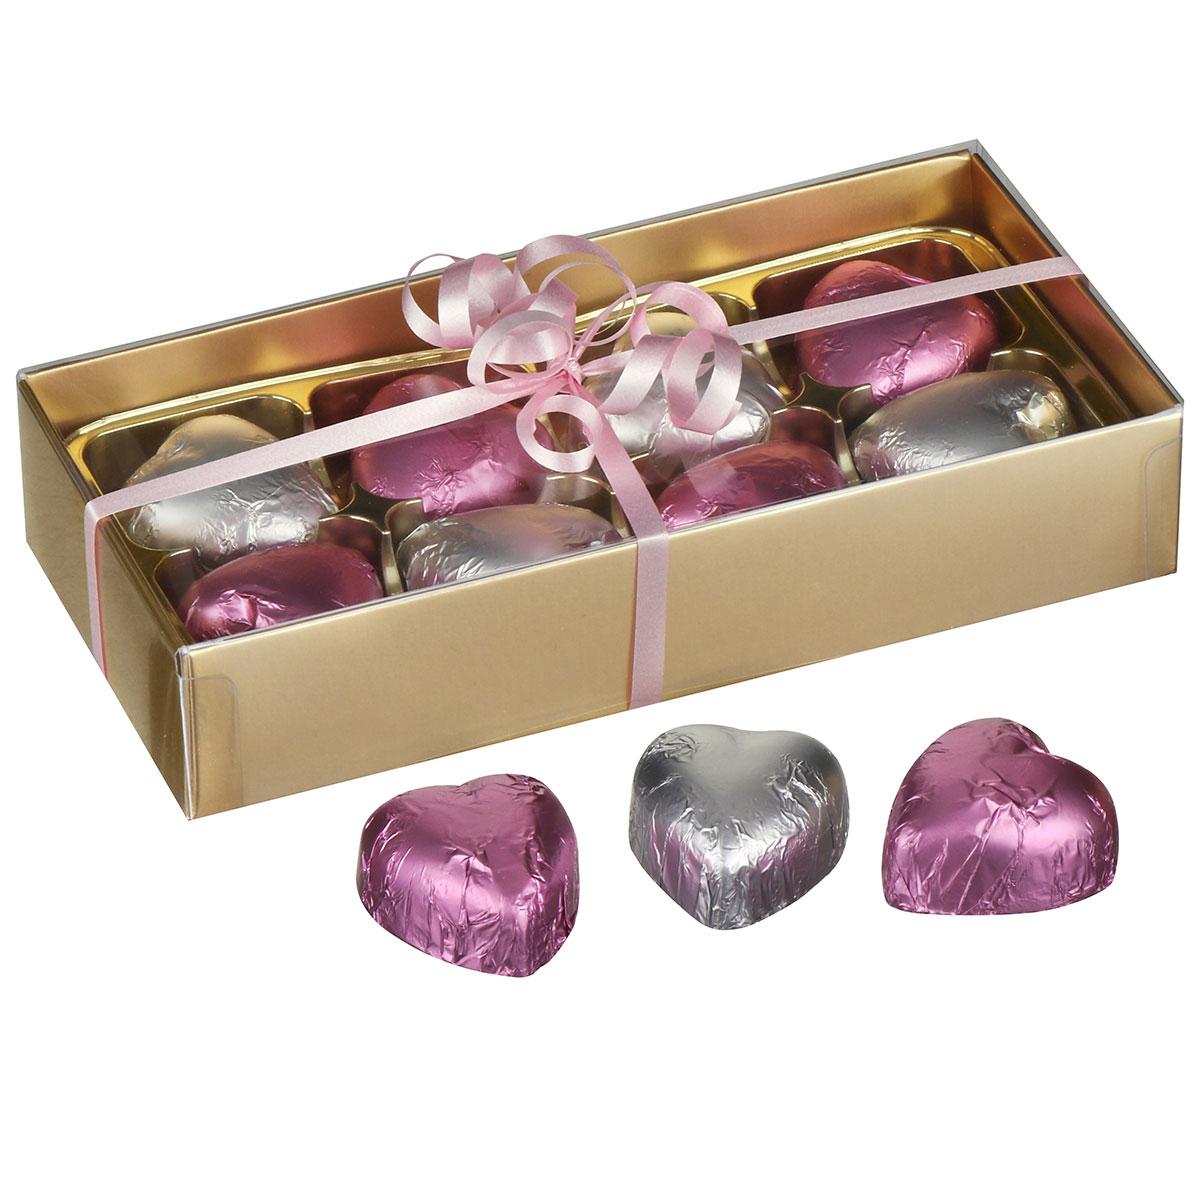 8 Hearts Belgian Chocolates in Gold Presentation Box